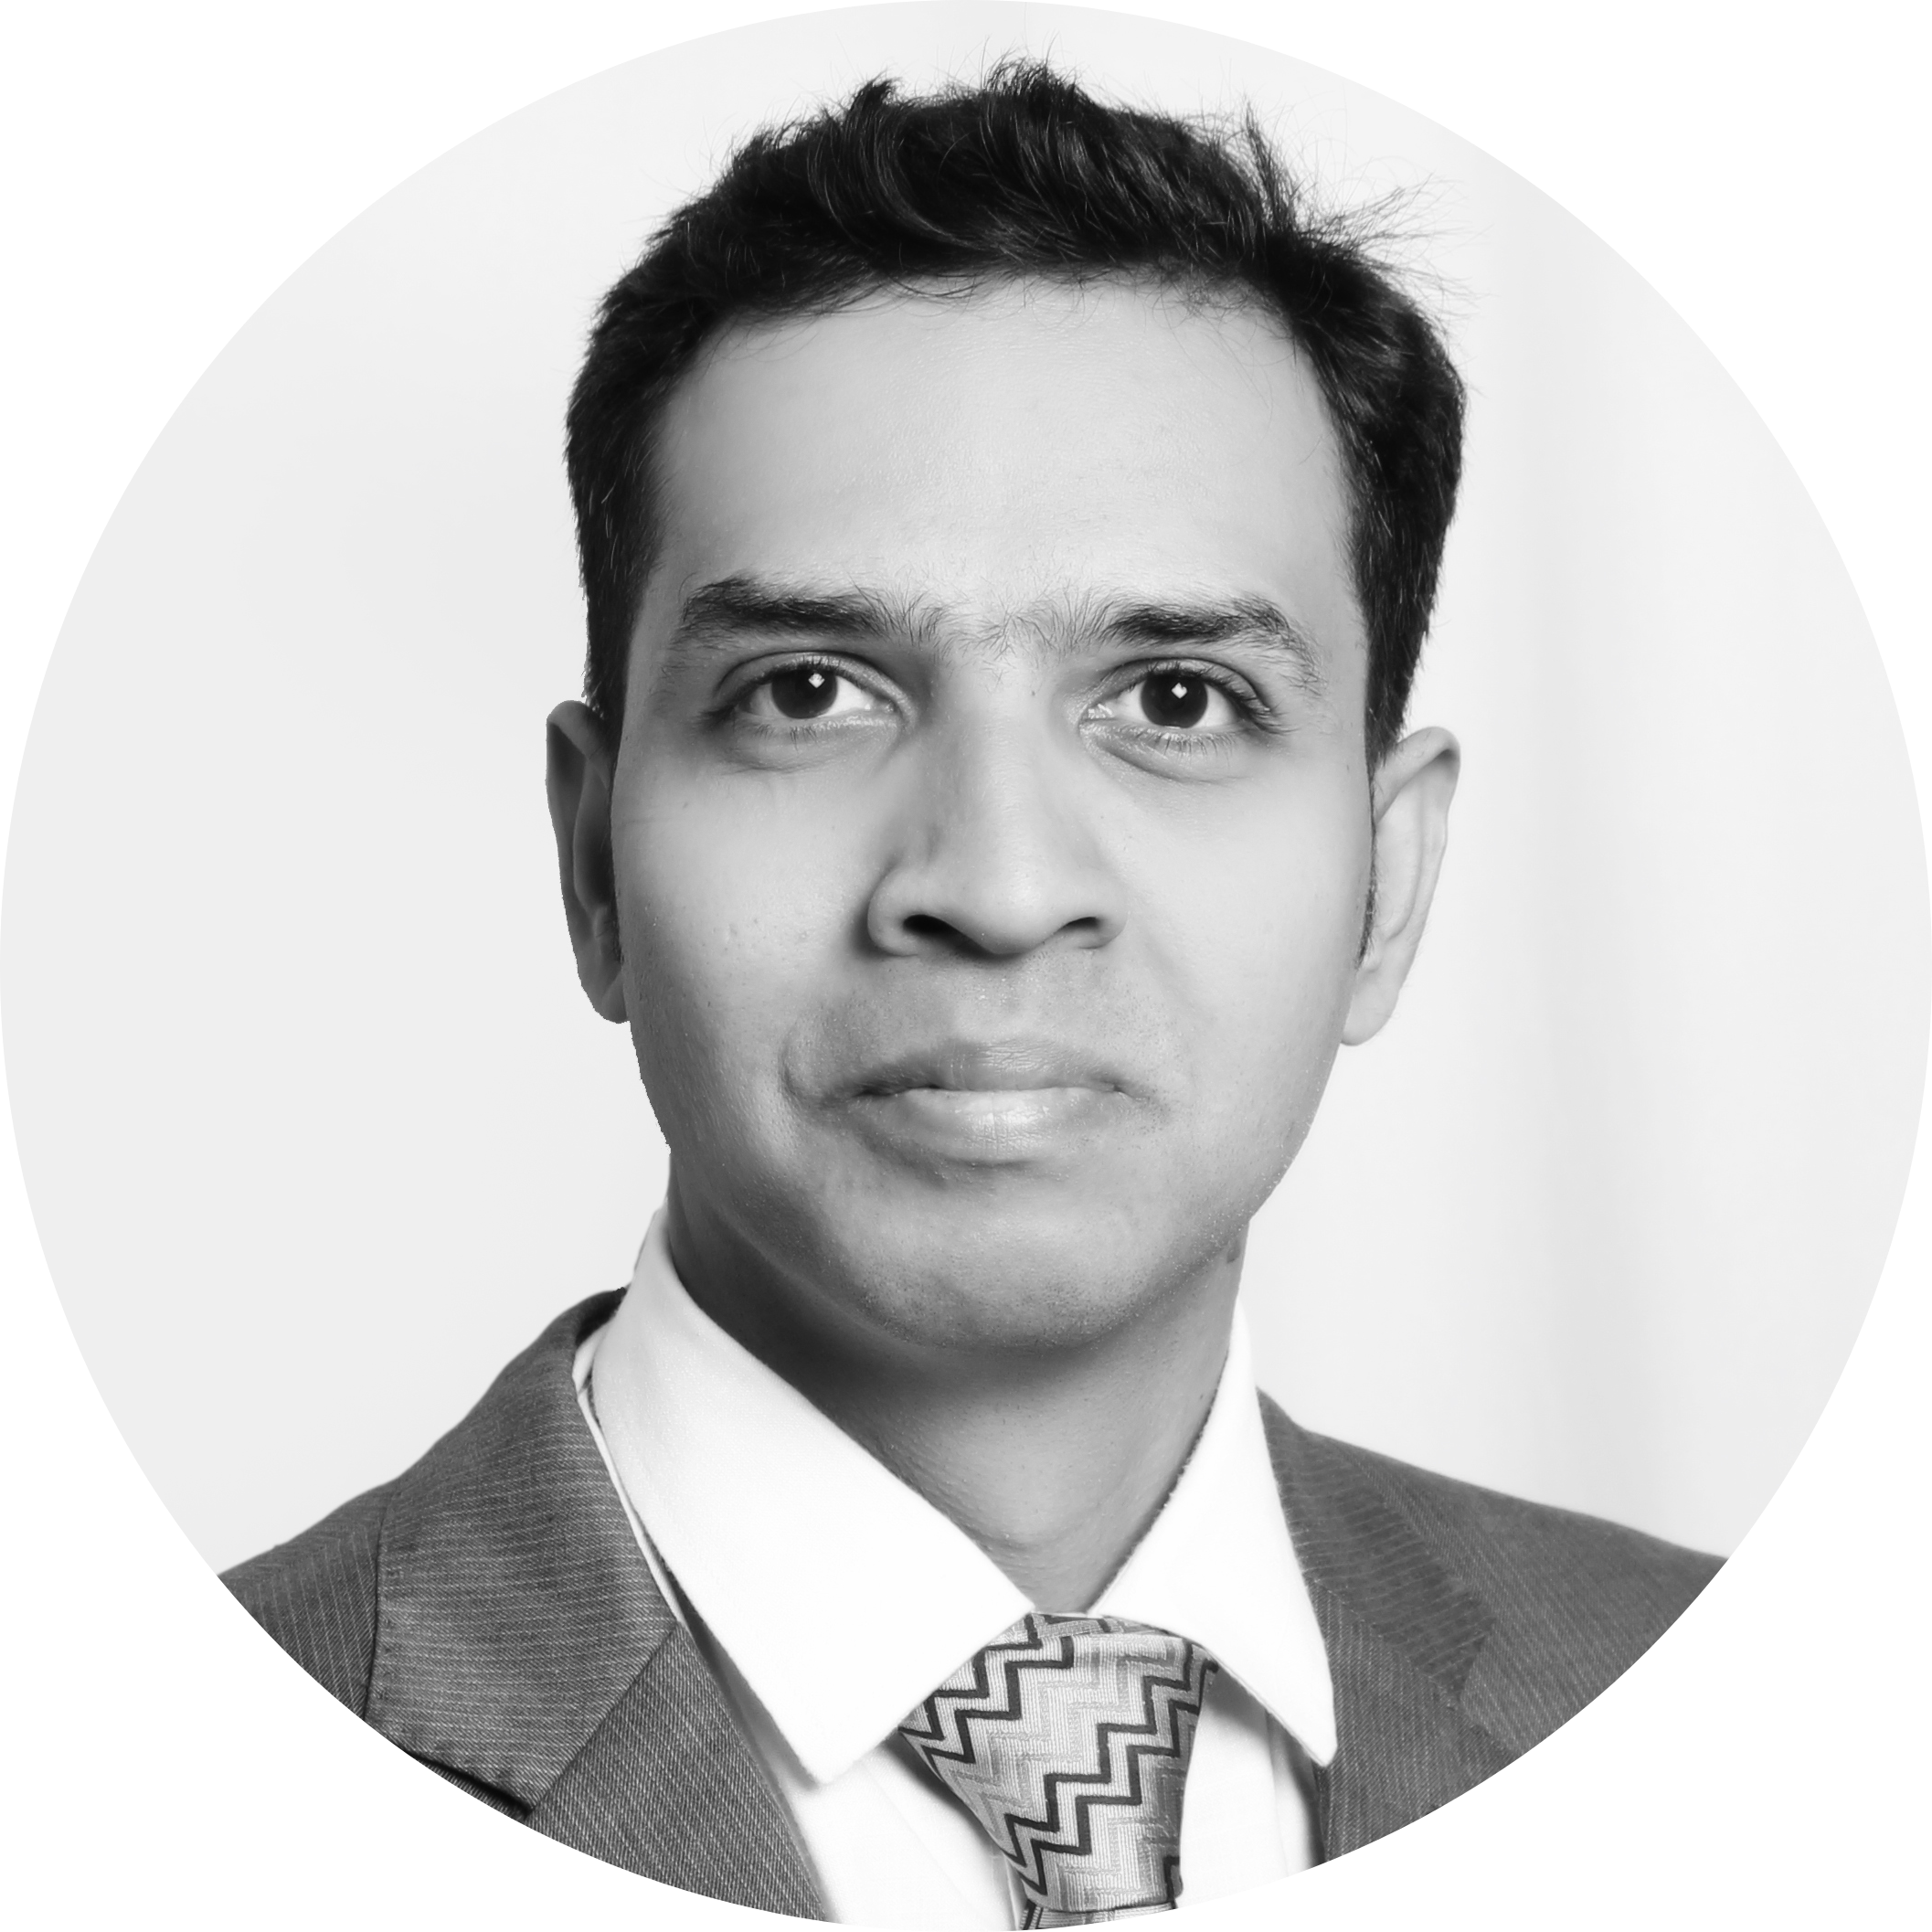 Gaurav Bhosale